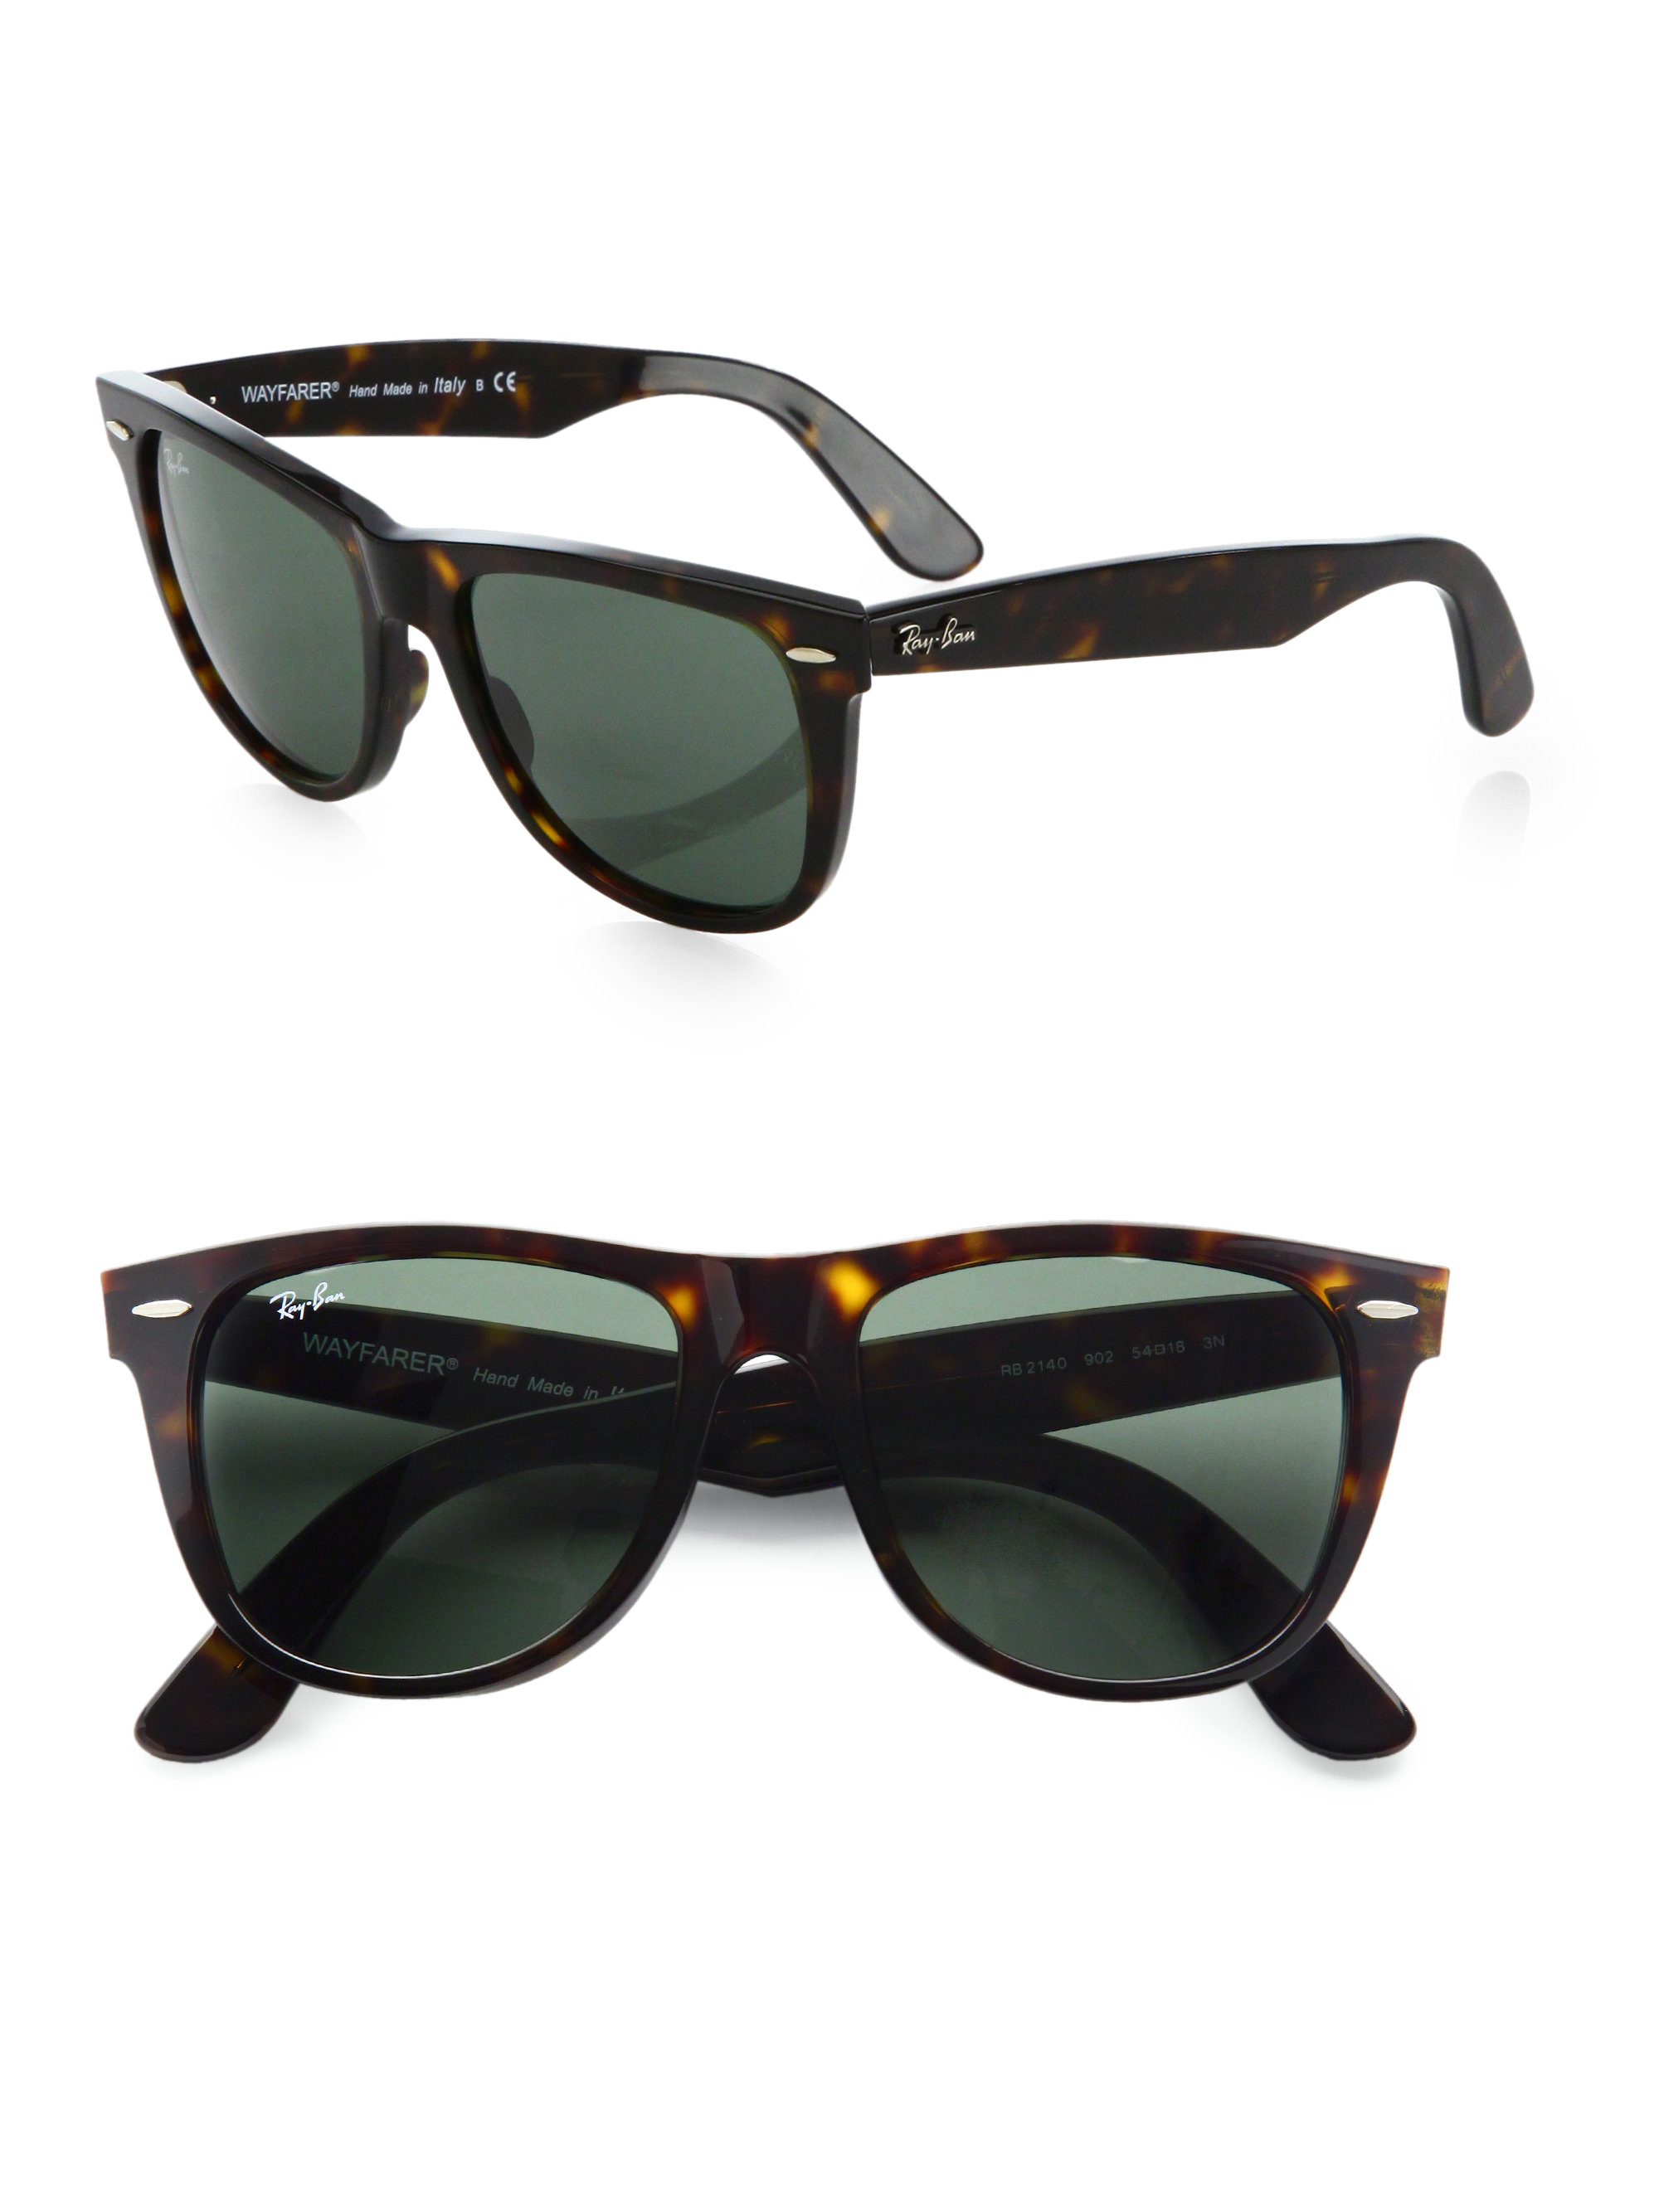 ray ban classic wayfarer black  Ray-ban Classic Wayfarer Sunglasses in Black